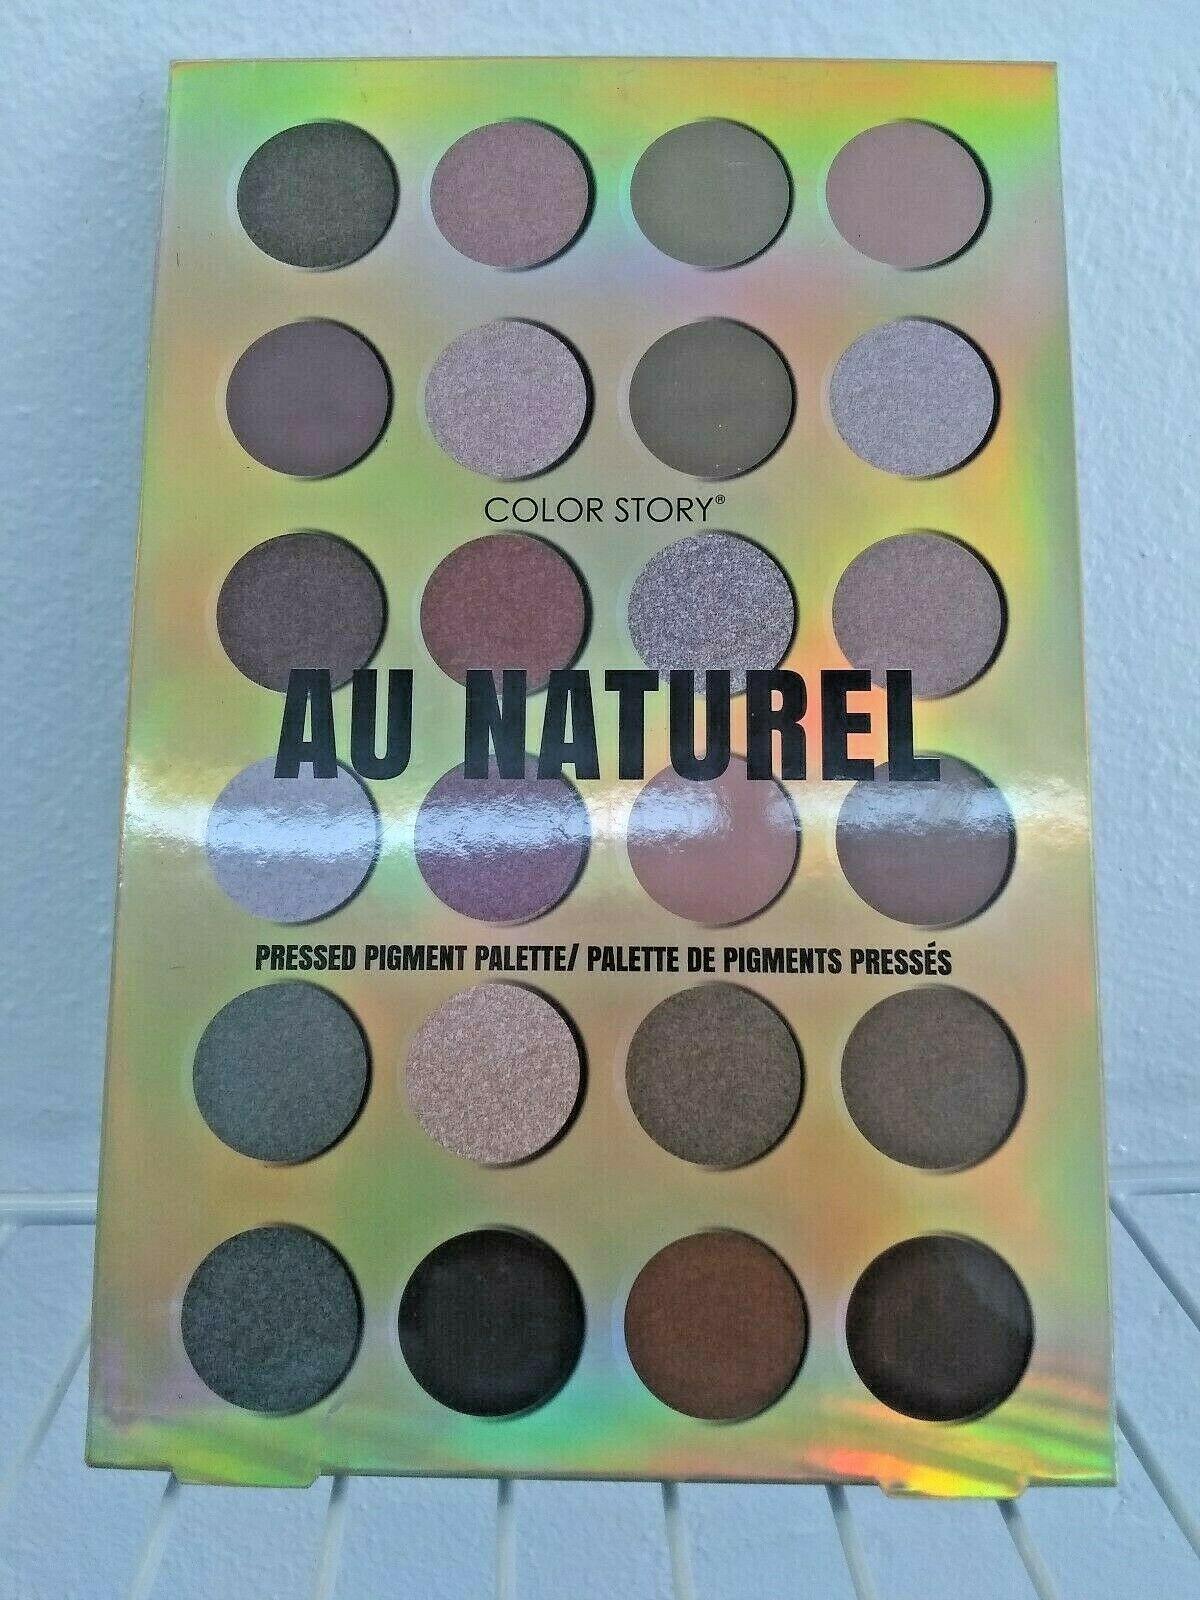 Au Naturel Color Story Pressed Pigment Pallet 24 Colors Eyeshadow